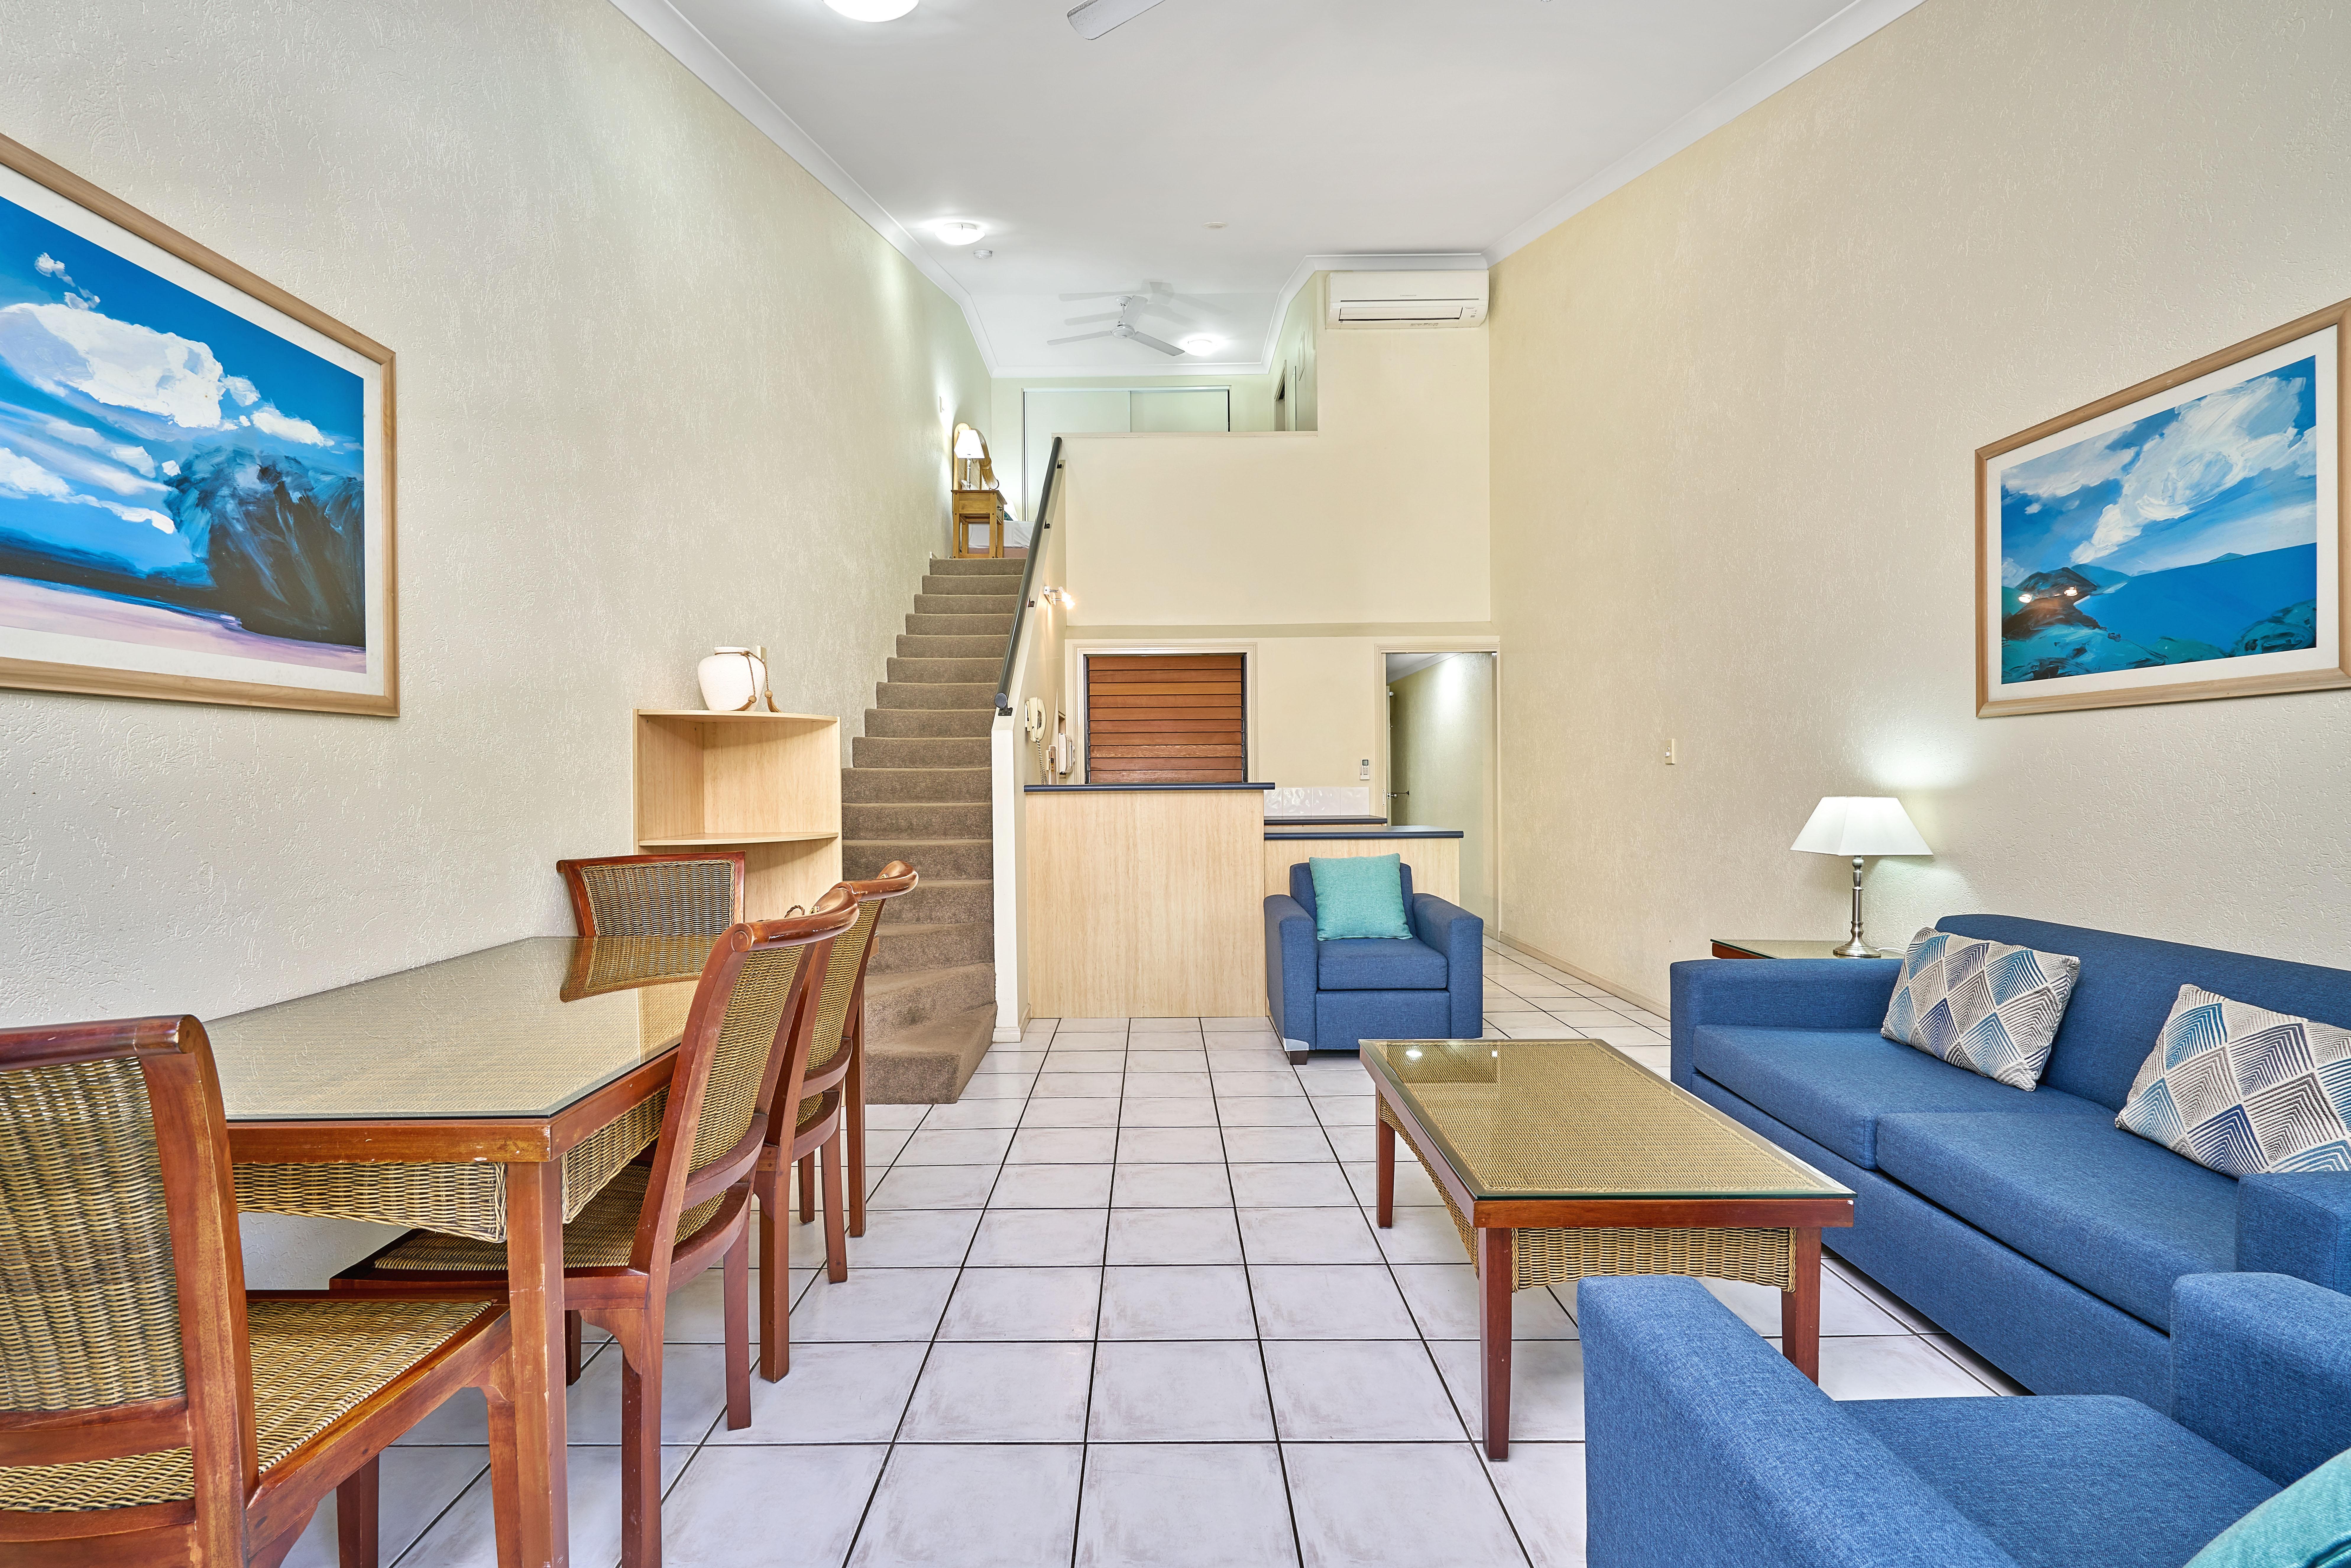 2 Bedroom - Mezzanine